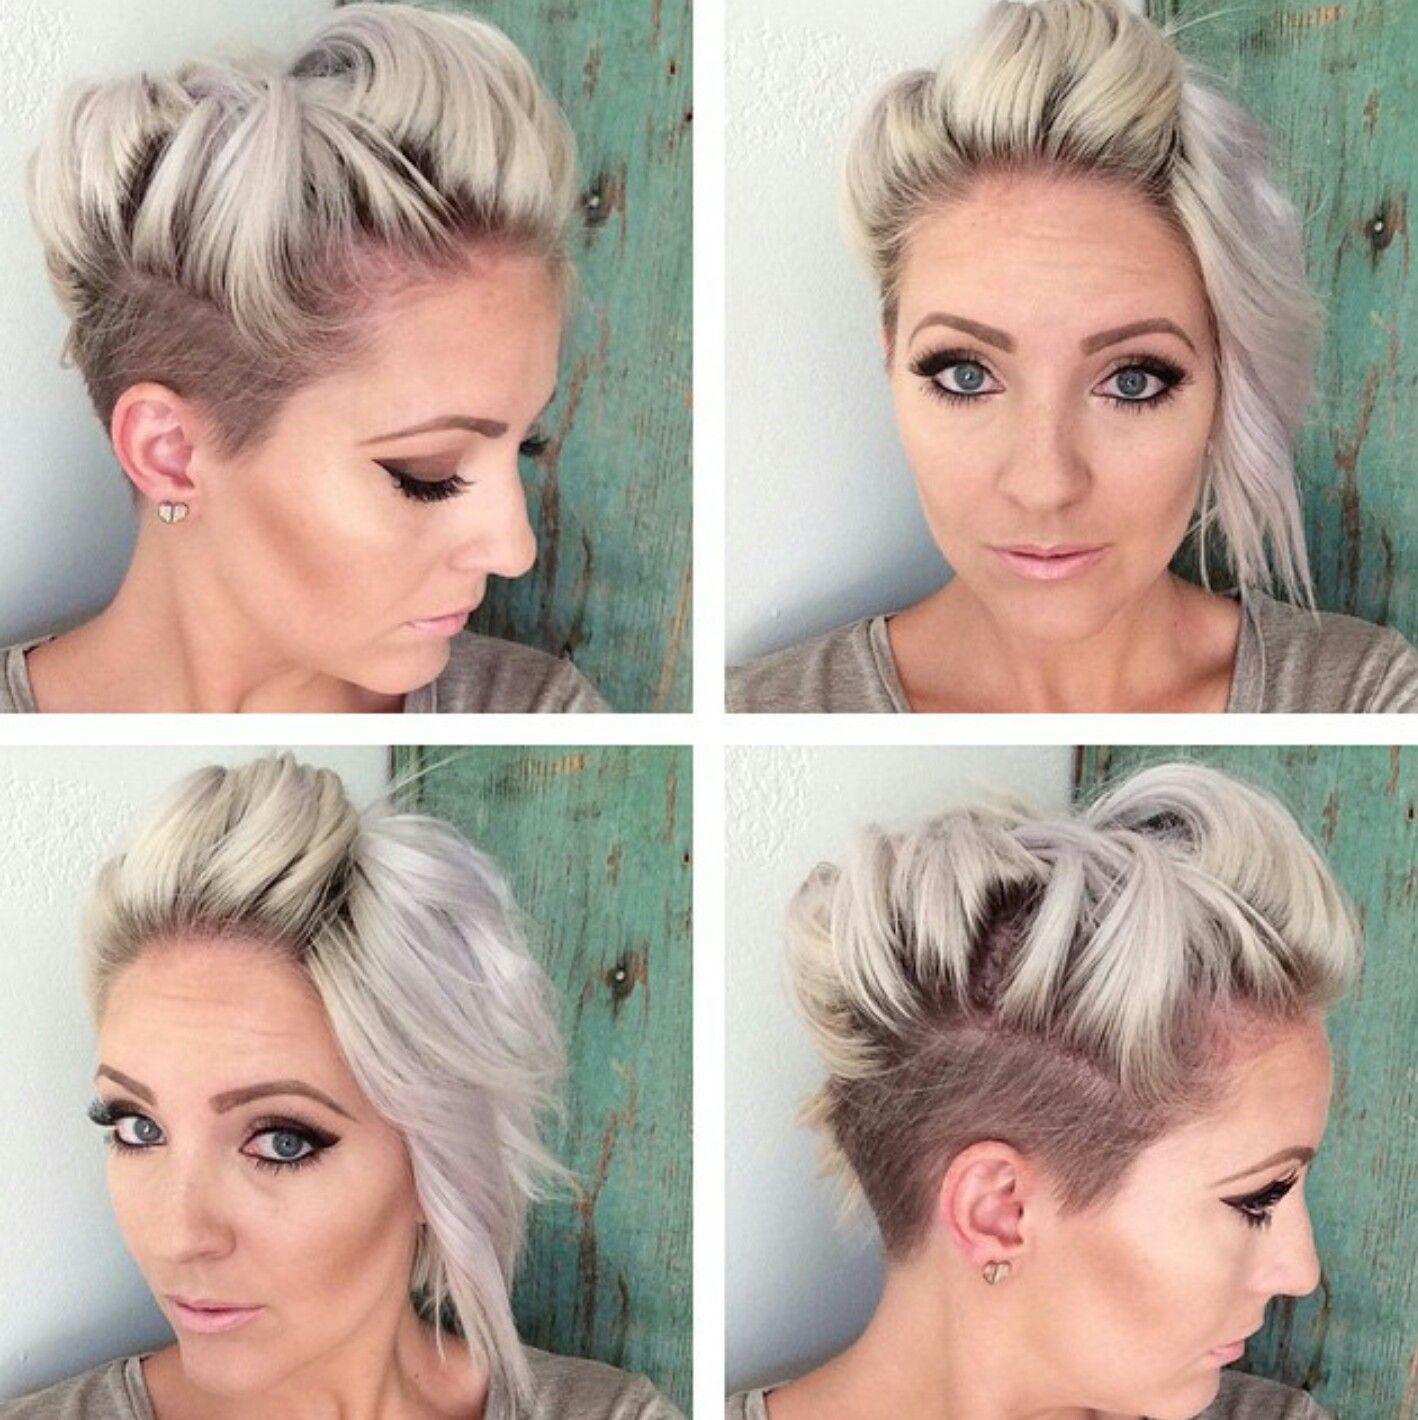 shaved side asymmetrical pixie | hair! in 2019 | short hair